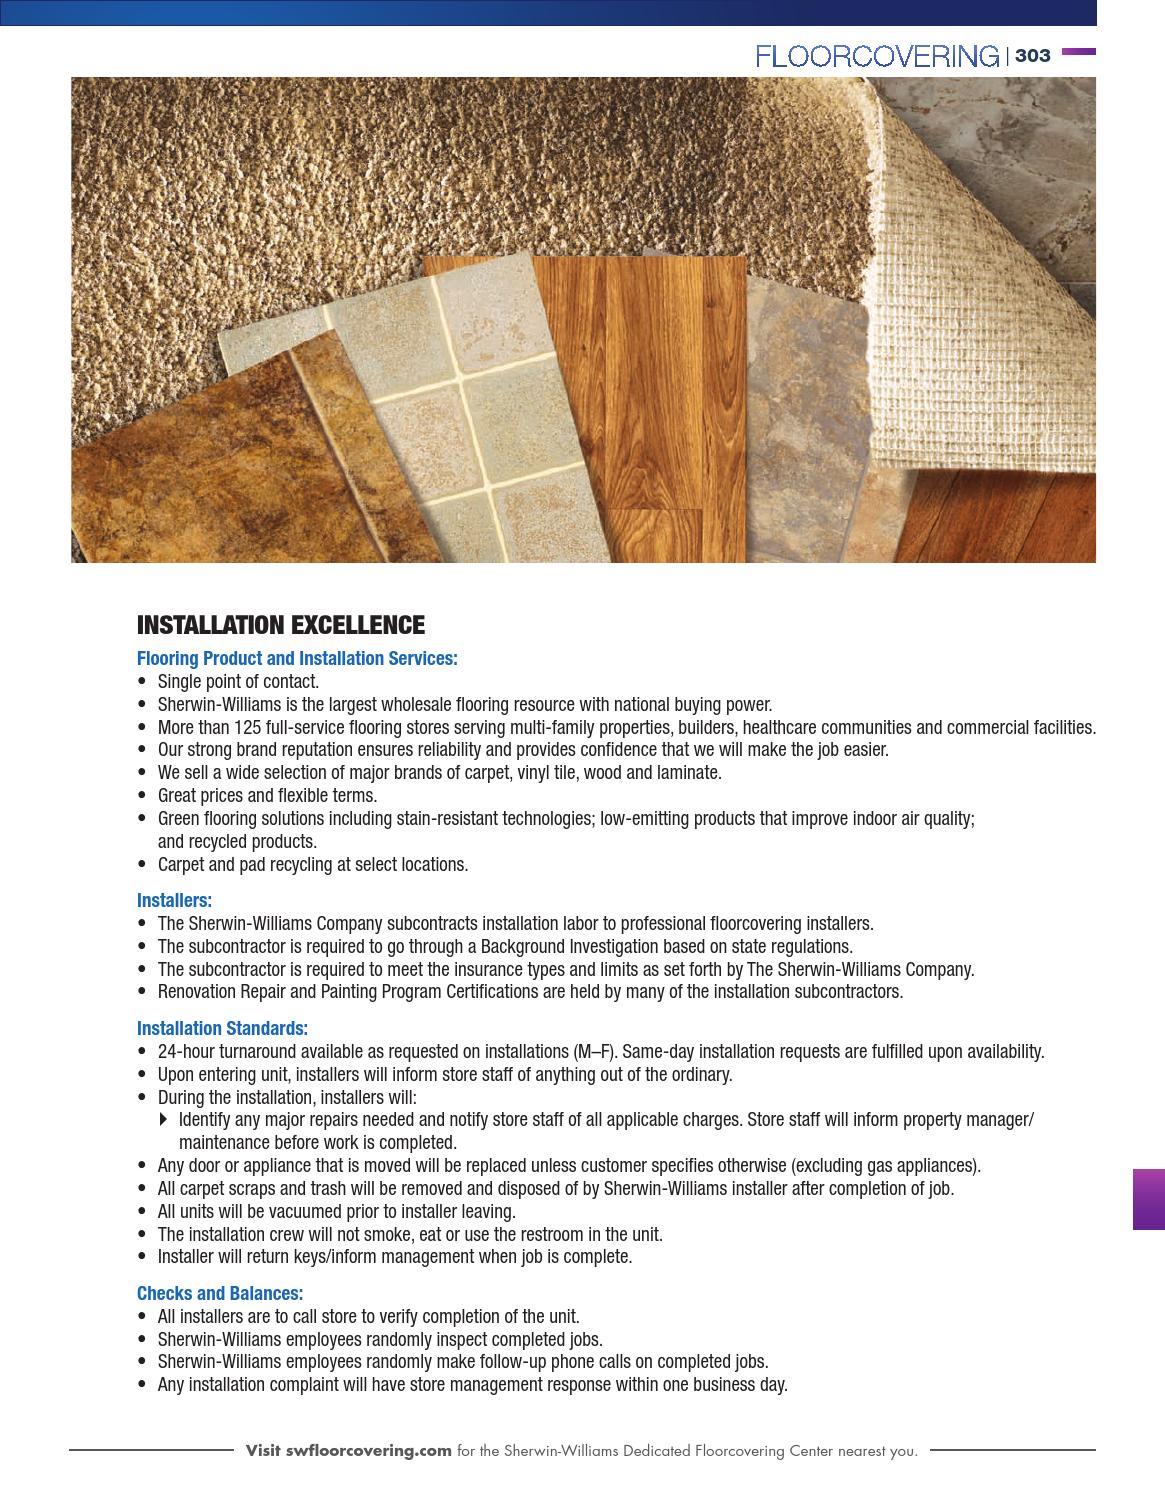 Sherwin-Williams - Facility Maintenance Catalog by Sherwin-Williams